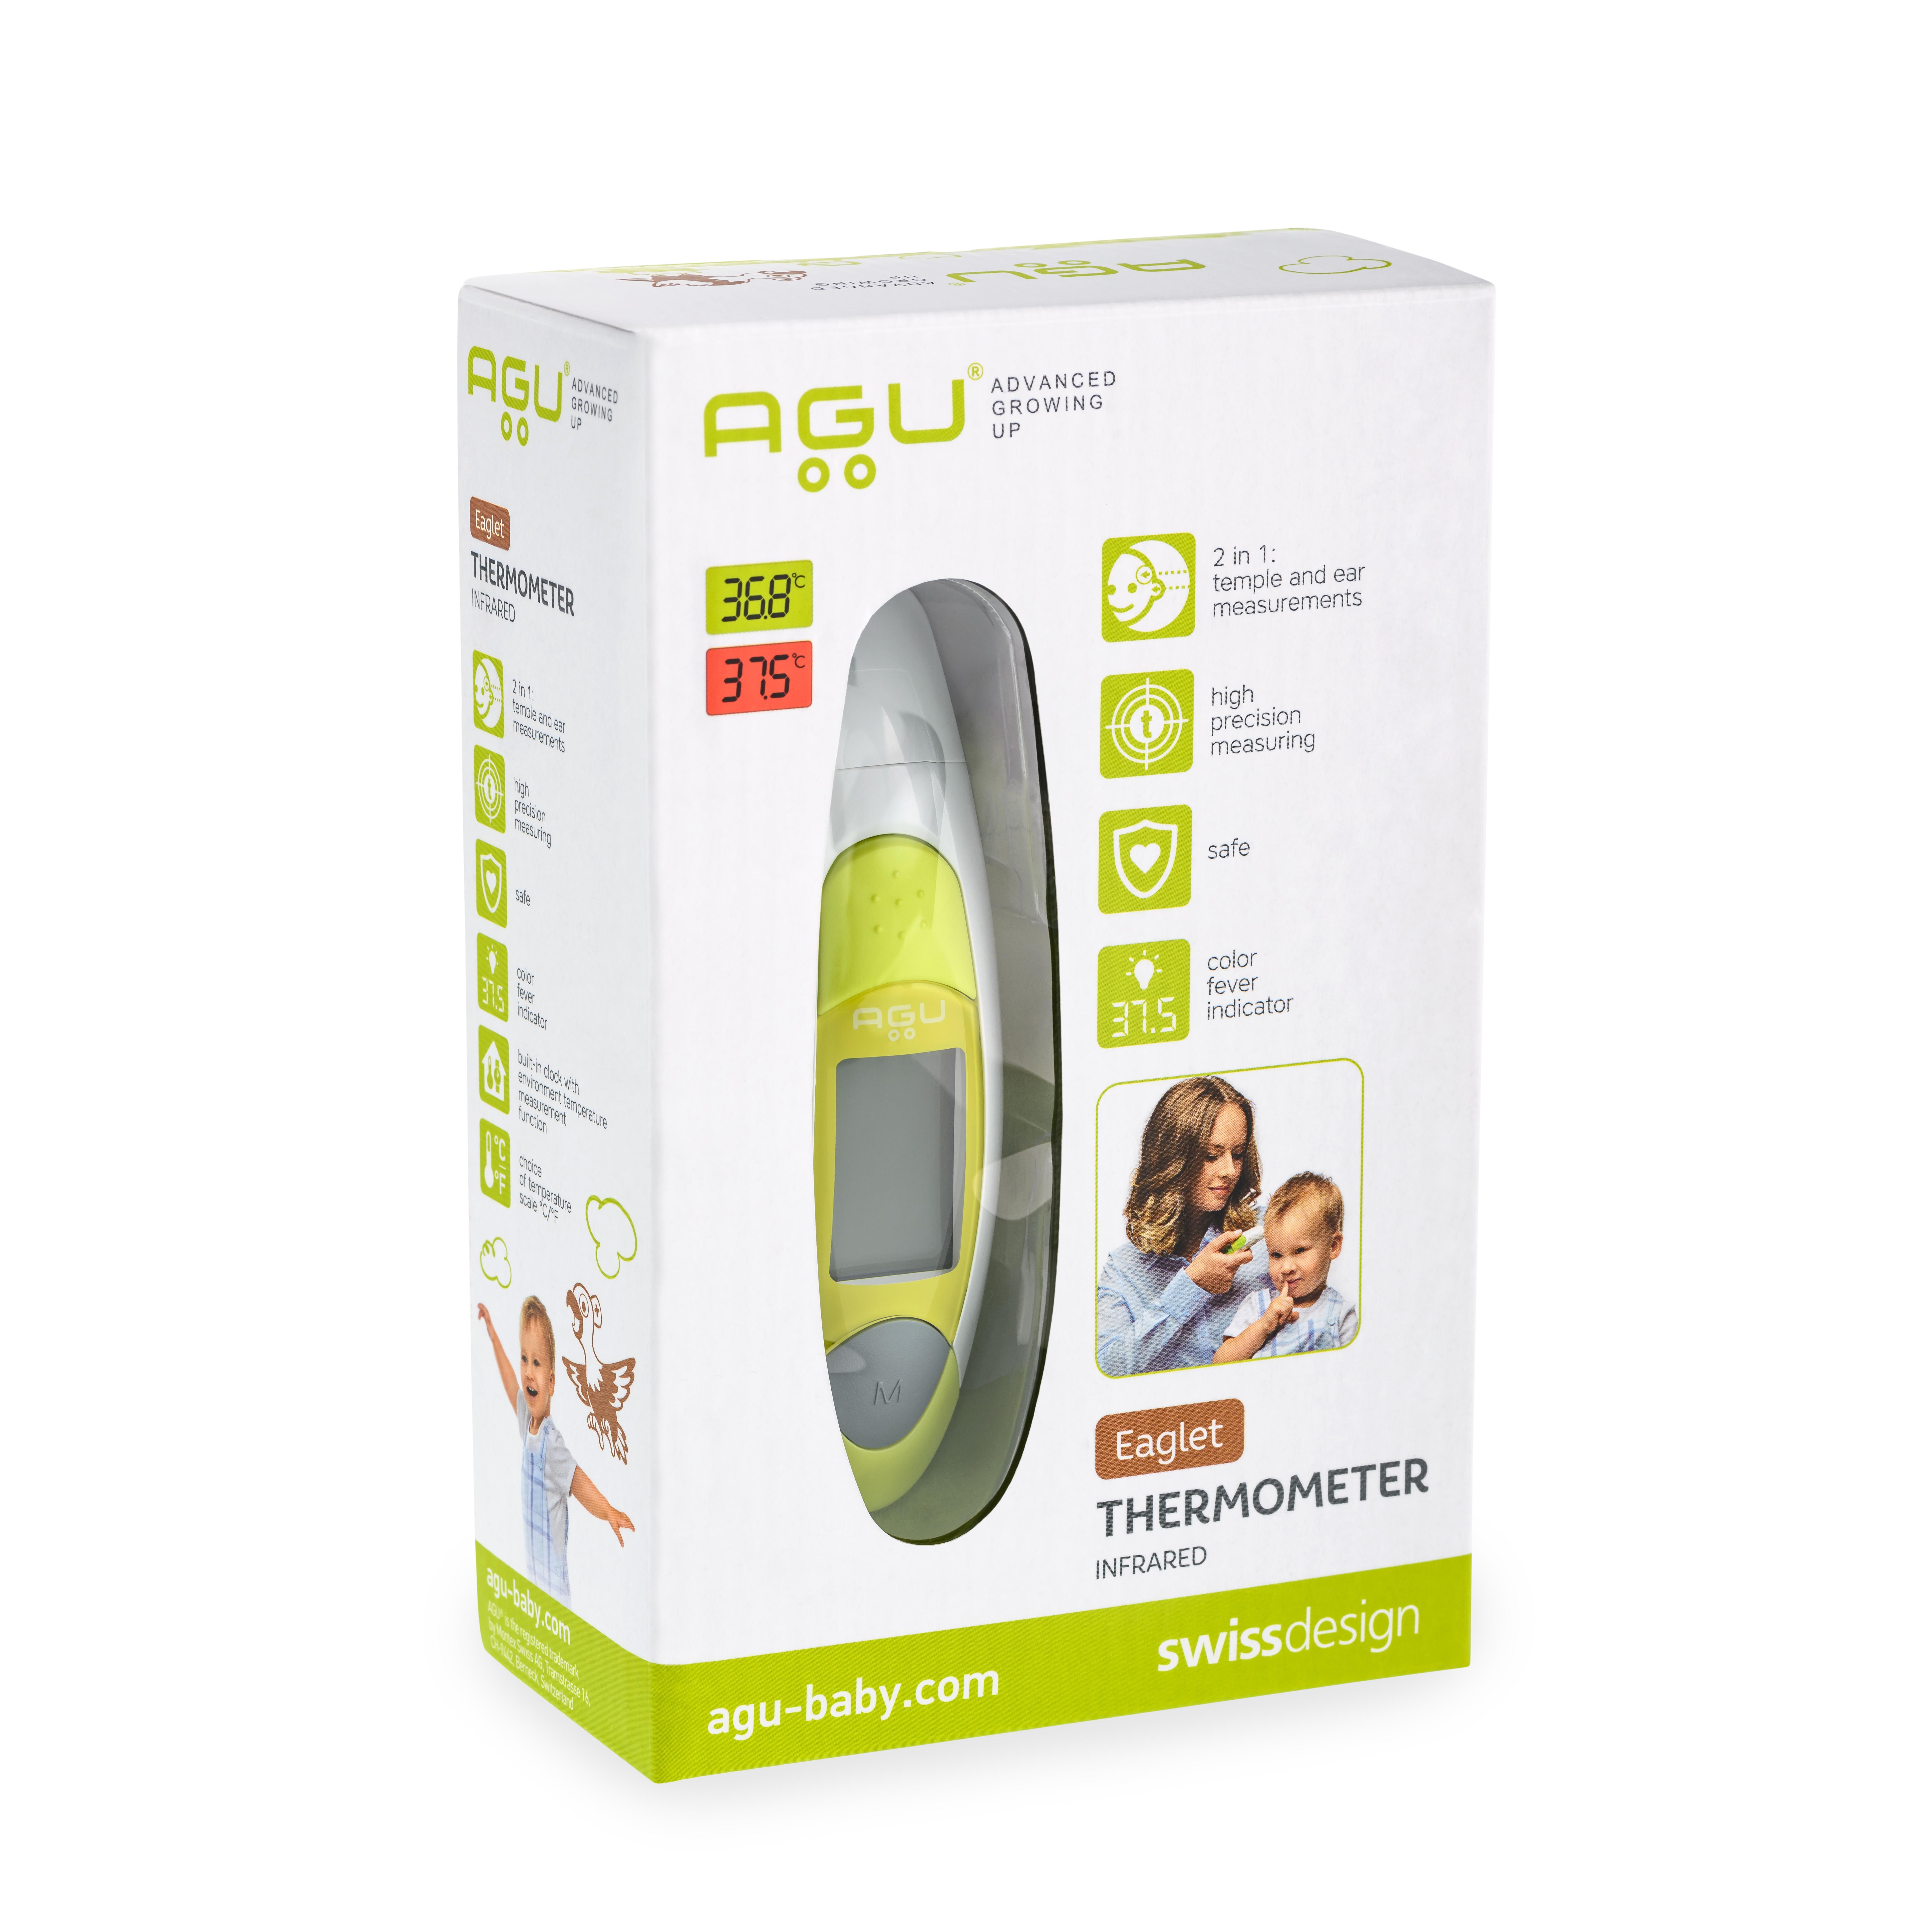 Termometru cu infrarosu pentru copii Eaglet, AGU 8